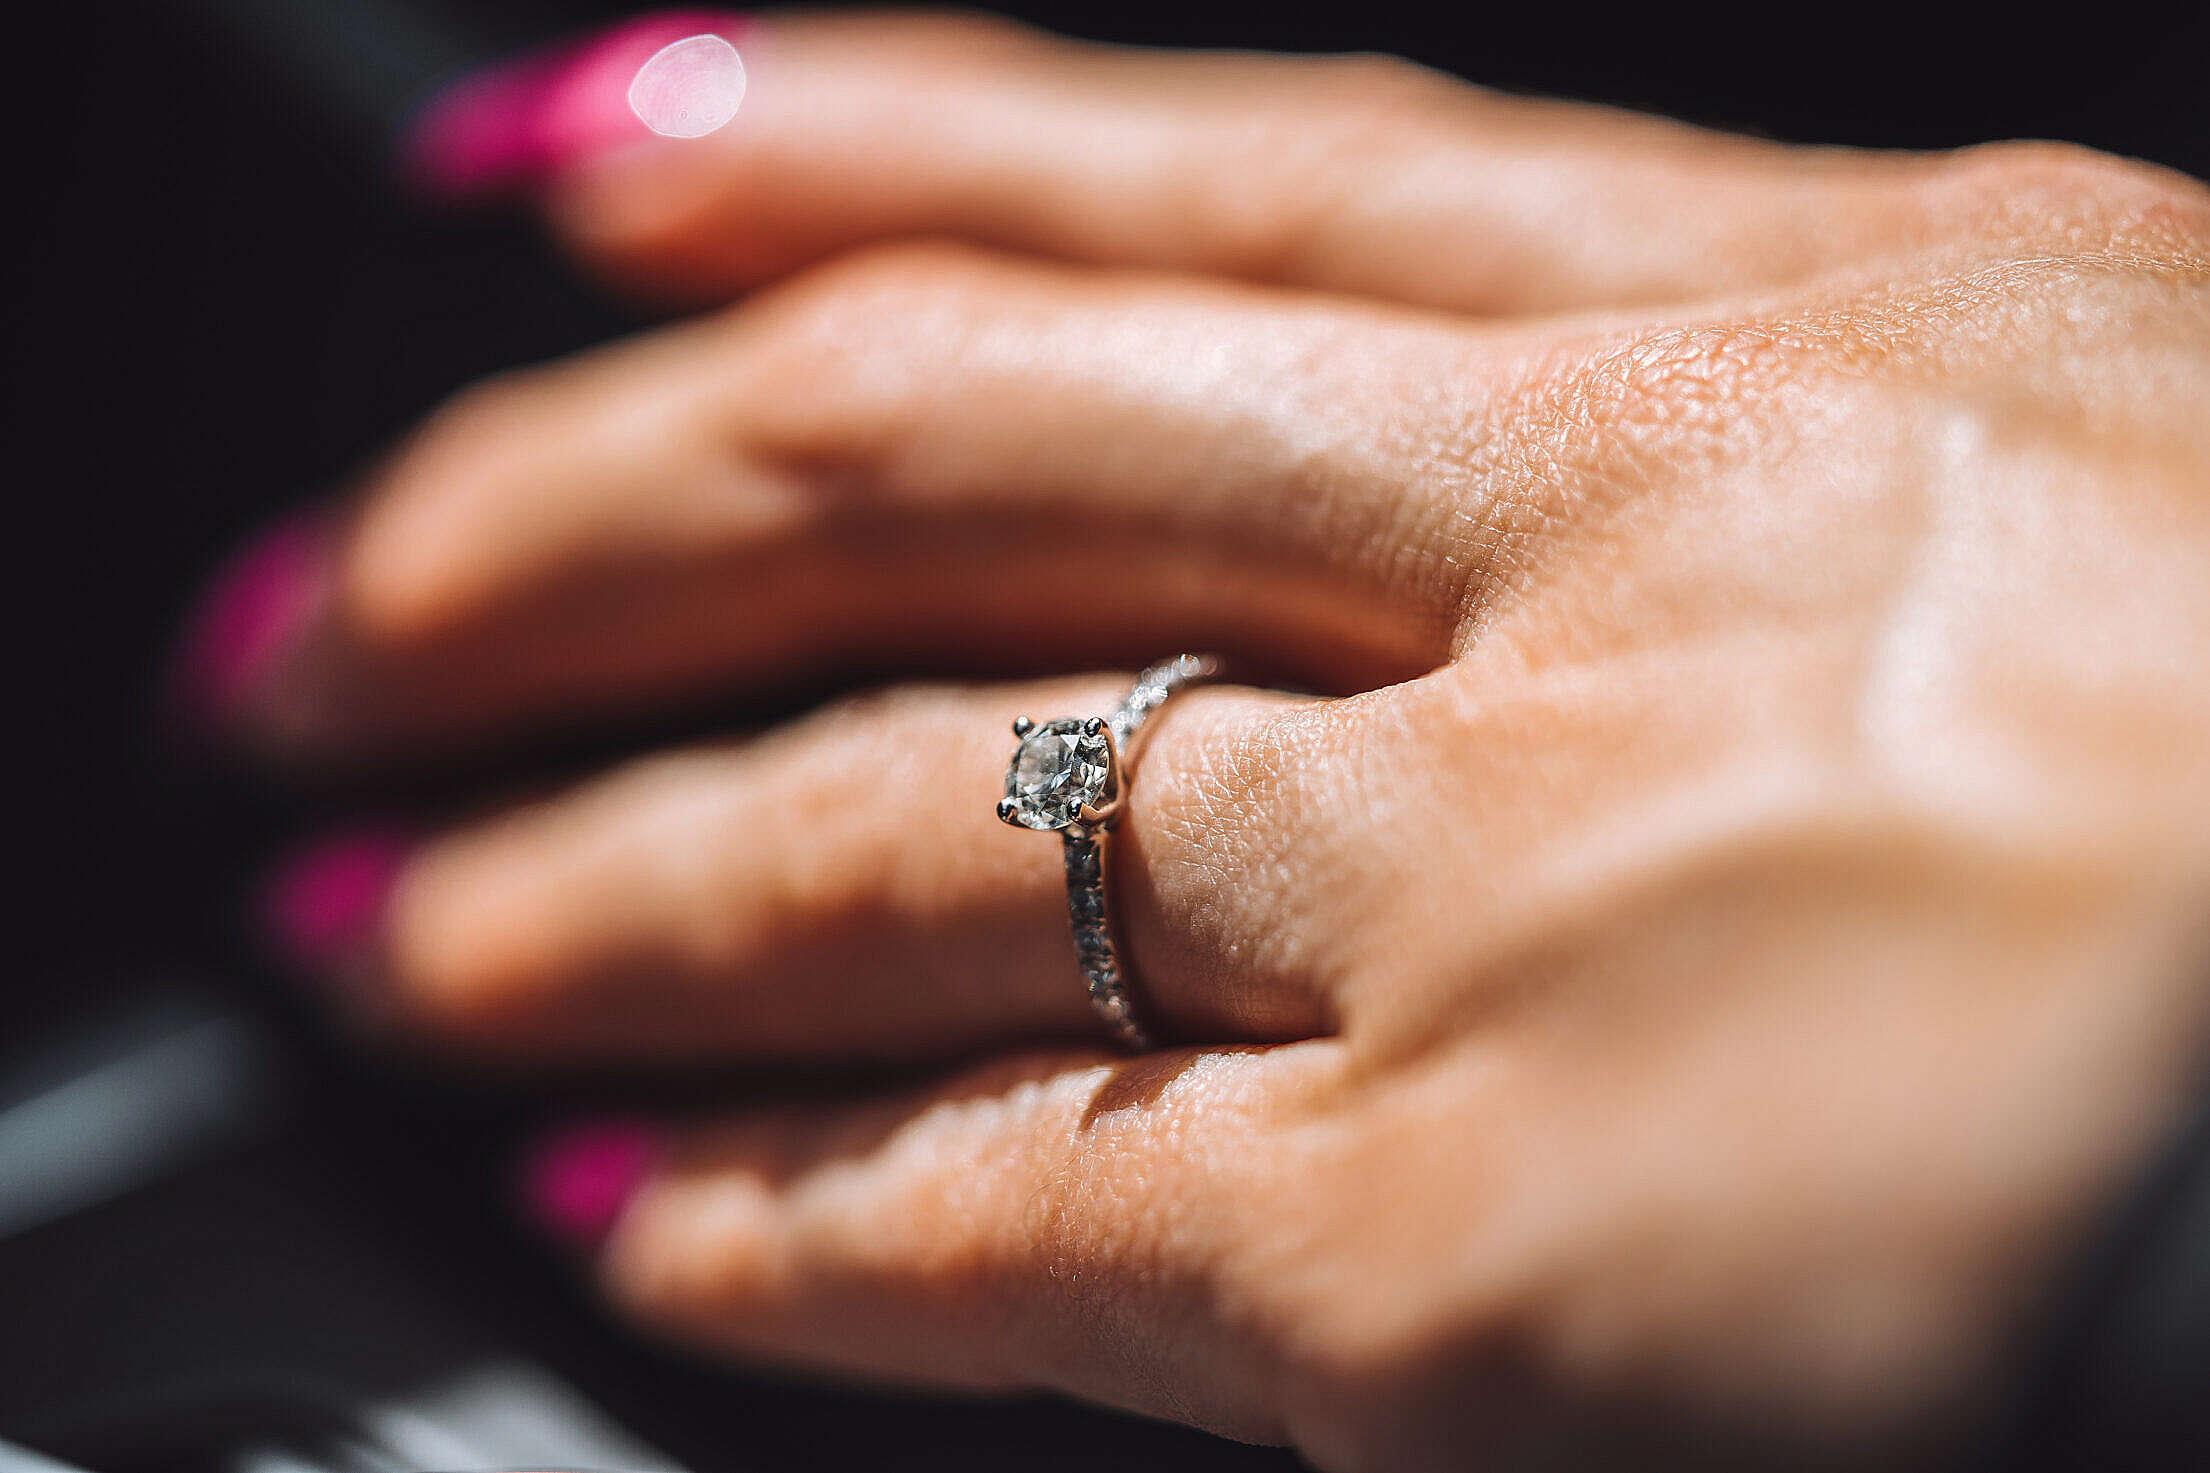 Diamond Engagement Ring Free Stock Photo